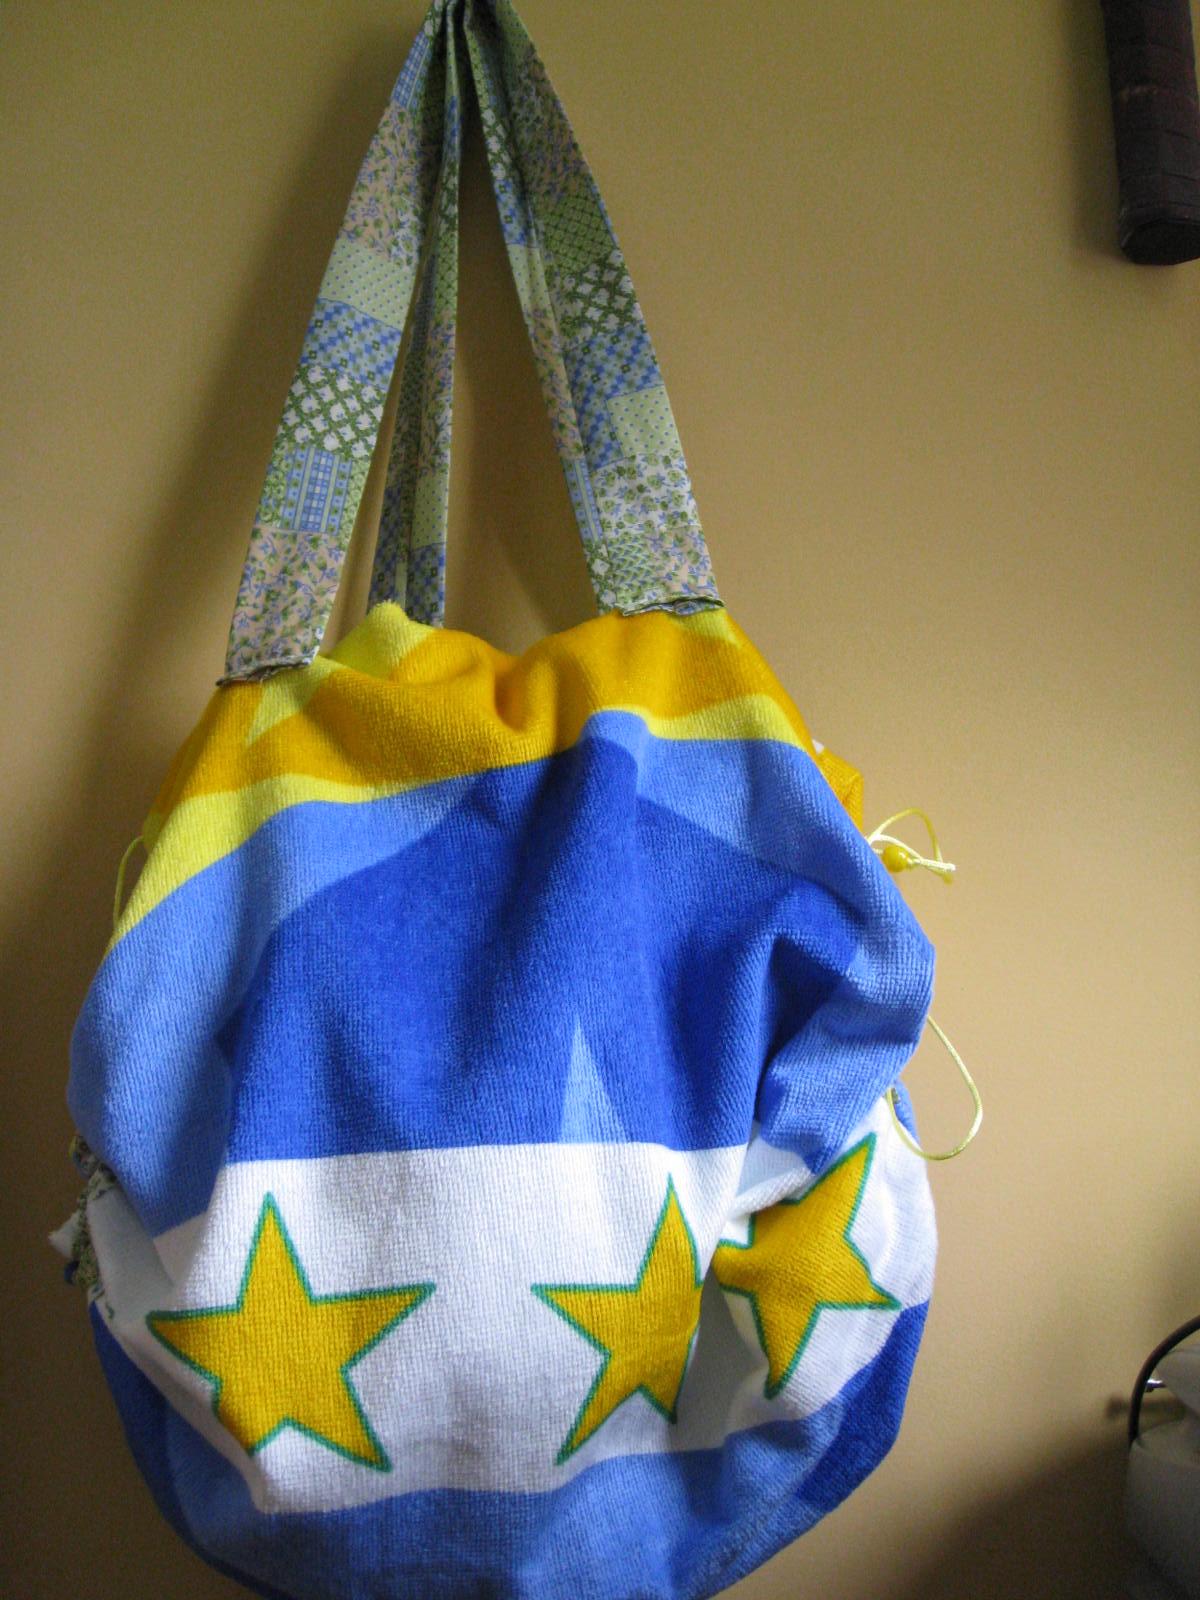 Gattipatch bolsas de praia piscina for Bolsa piscina